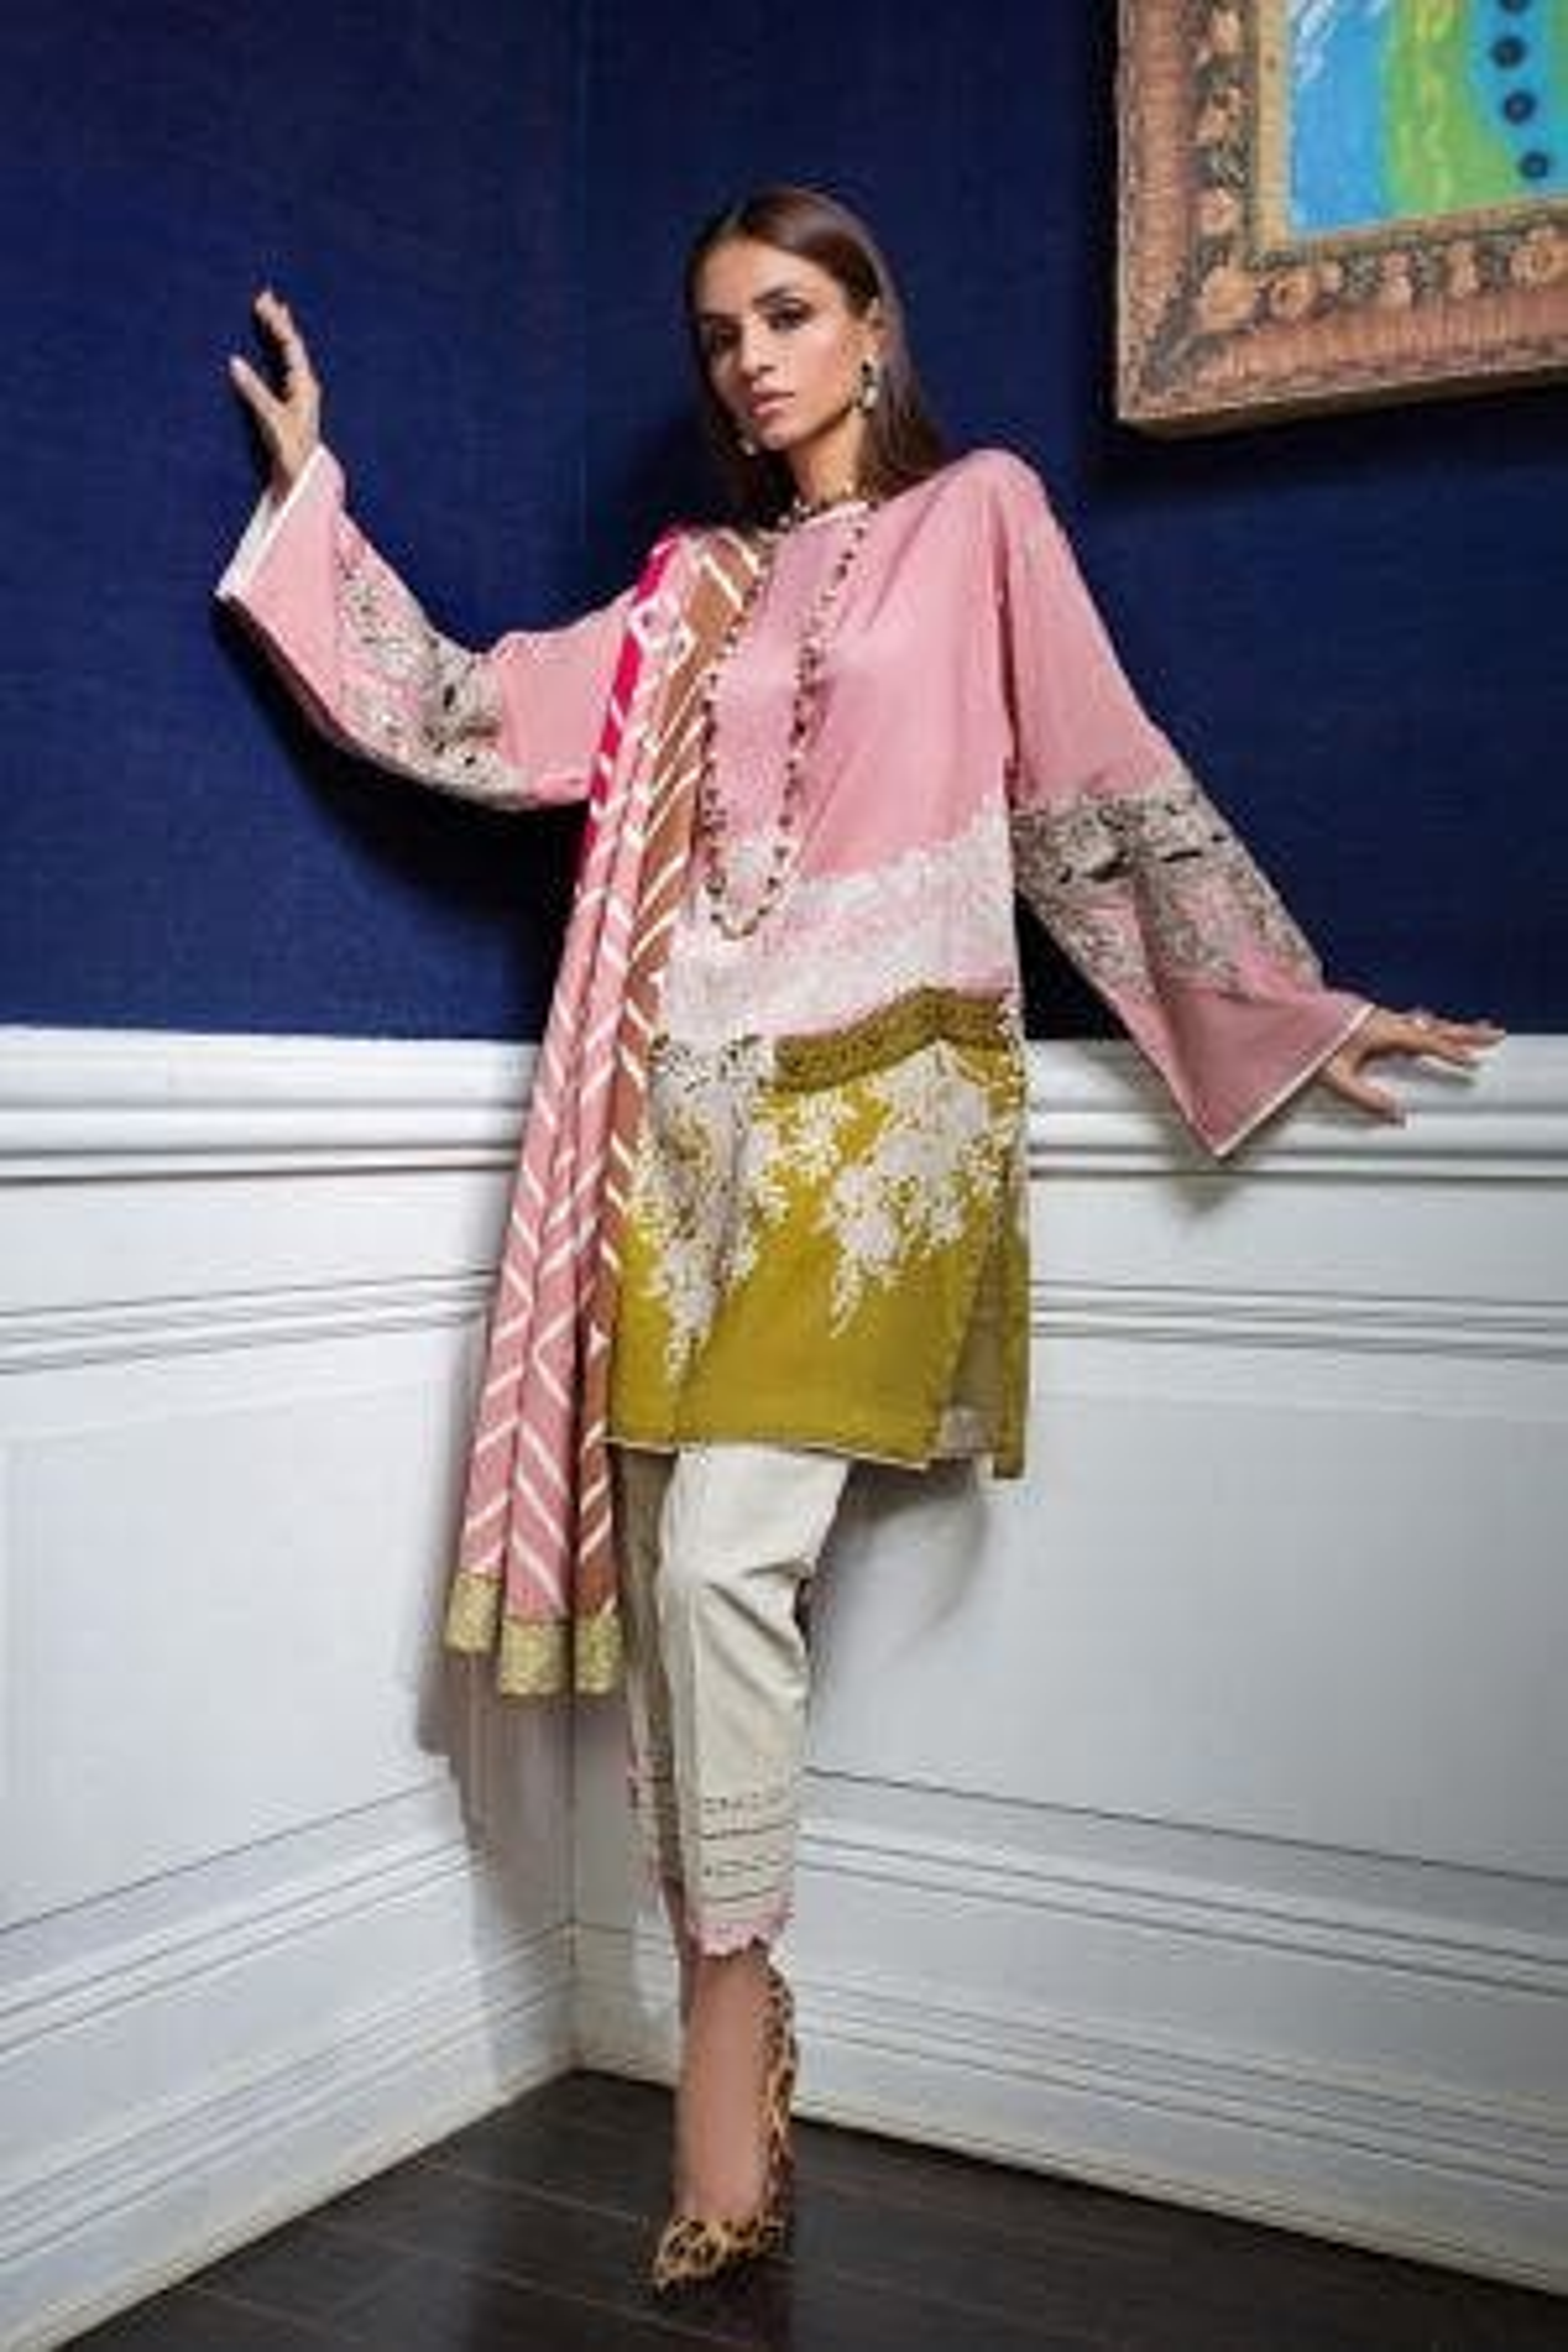 Sana Safinaz Online Design # 008B